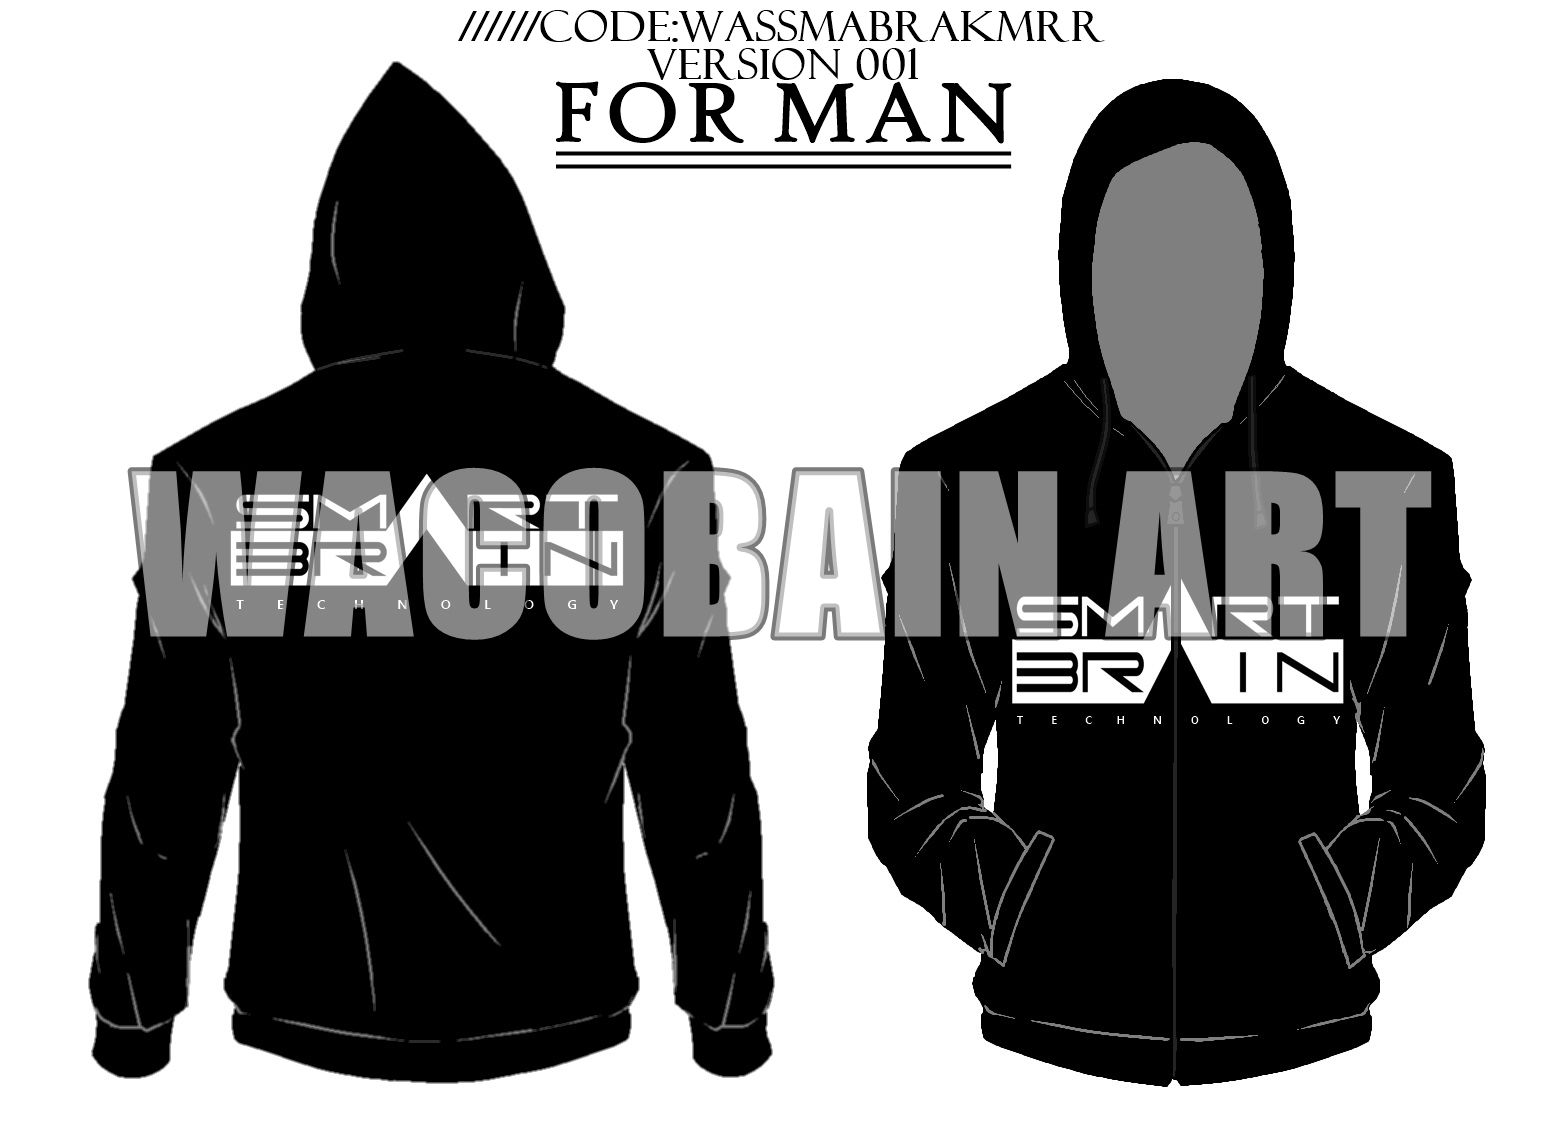 530 Koleksi Desain Logo Jaket Keren HD Terbaik